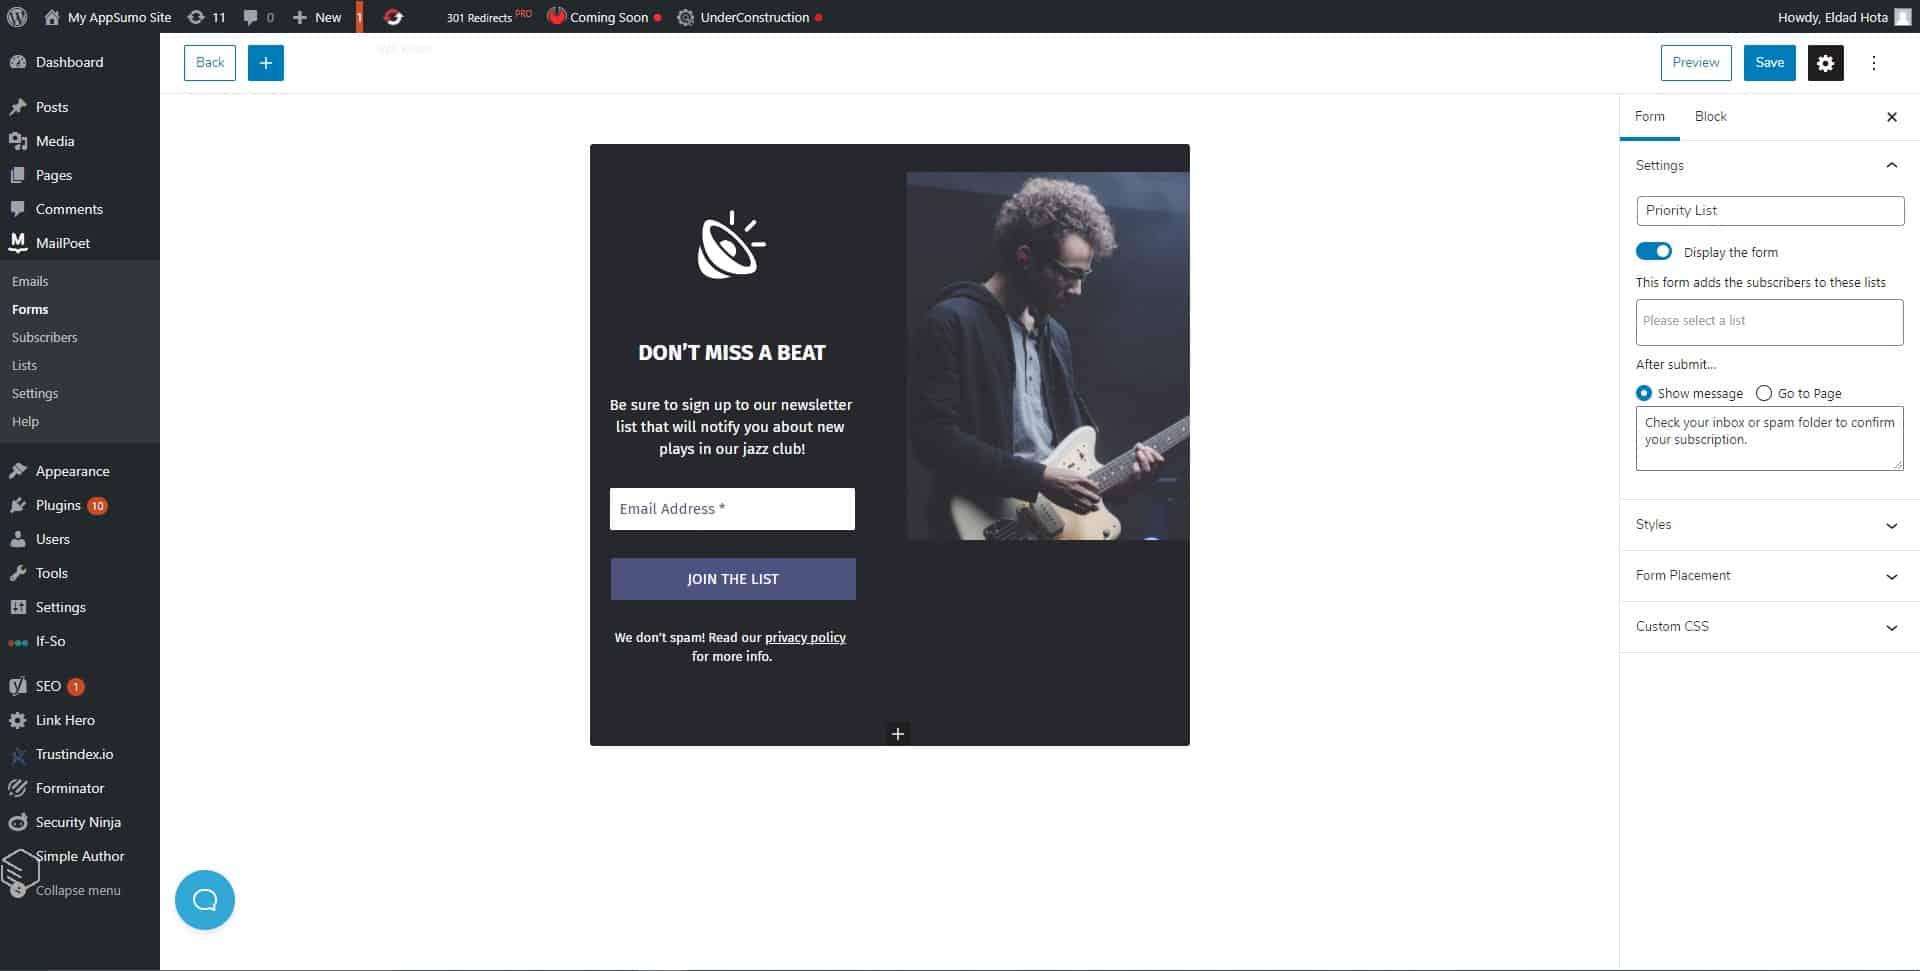 MailPoet form designer